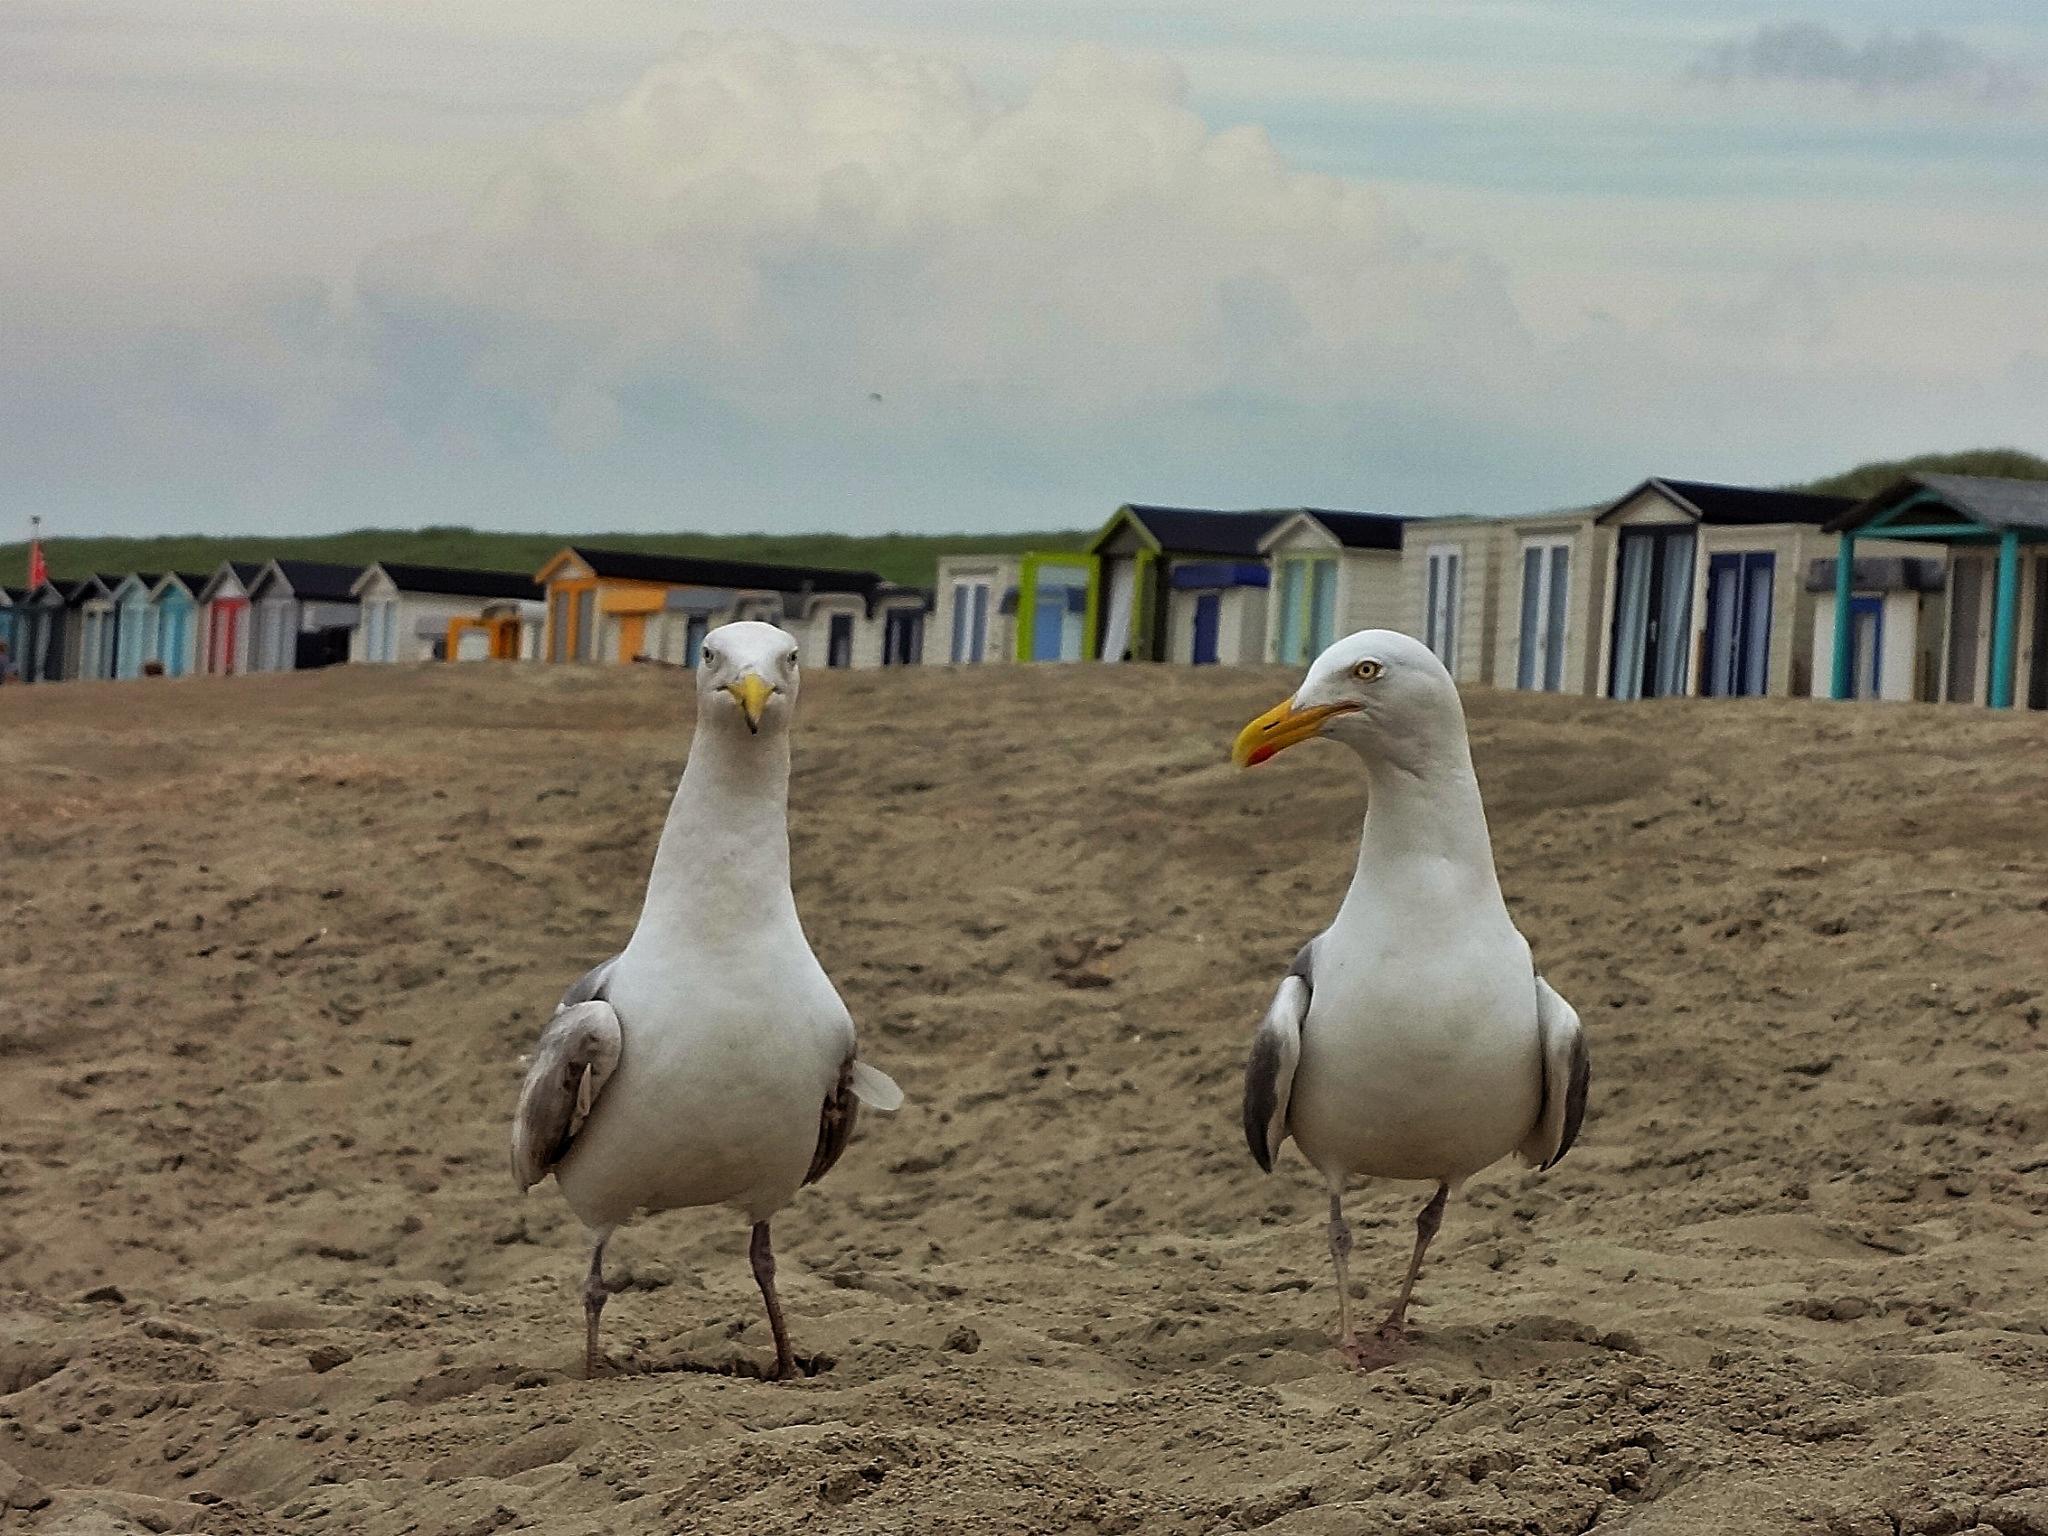 Netherlands - Egmond aan Zee by NA